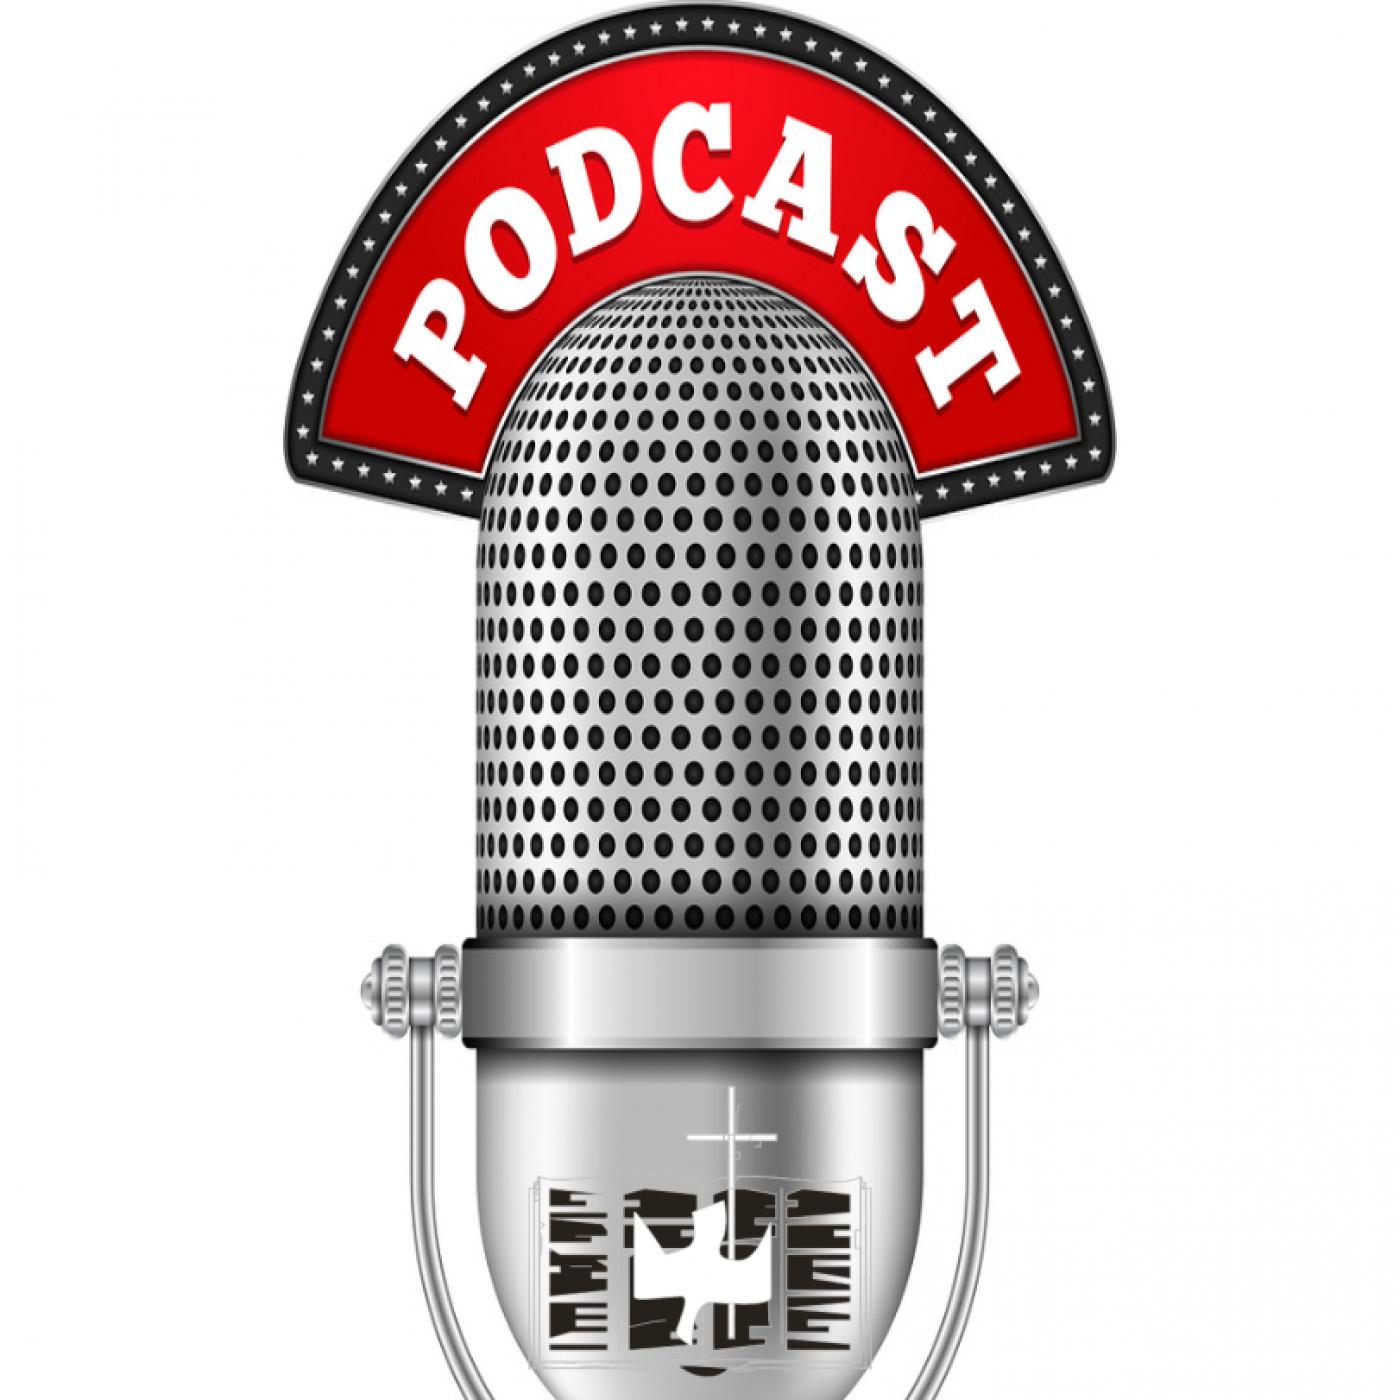 <![CDATA[Podcast Lids]]>